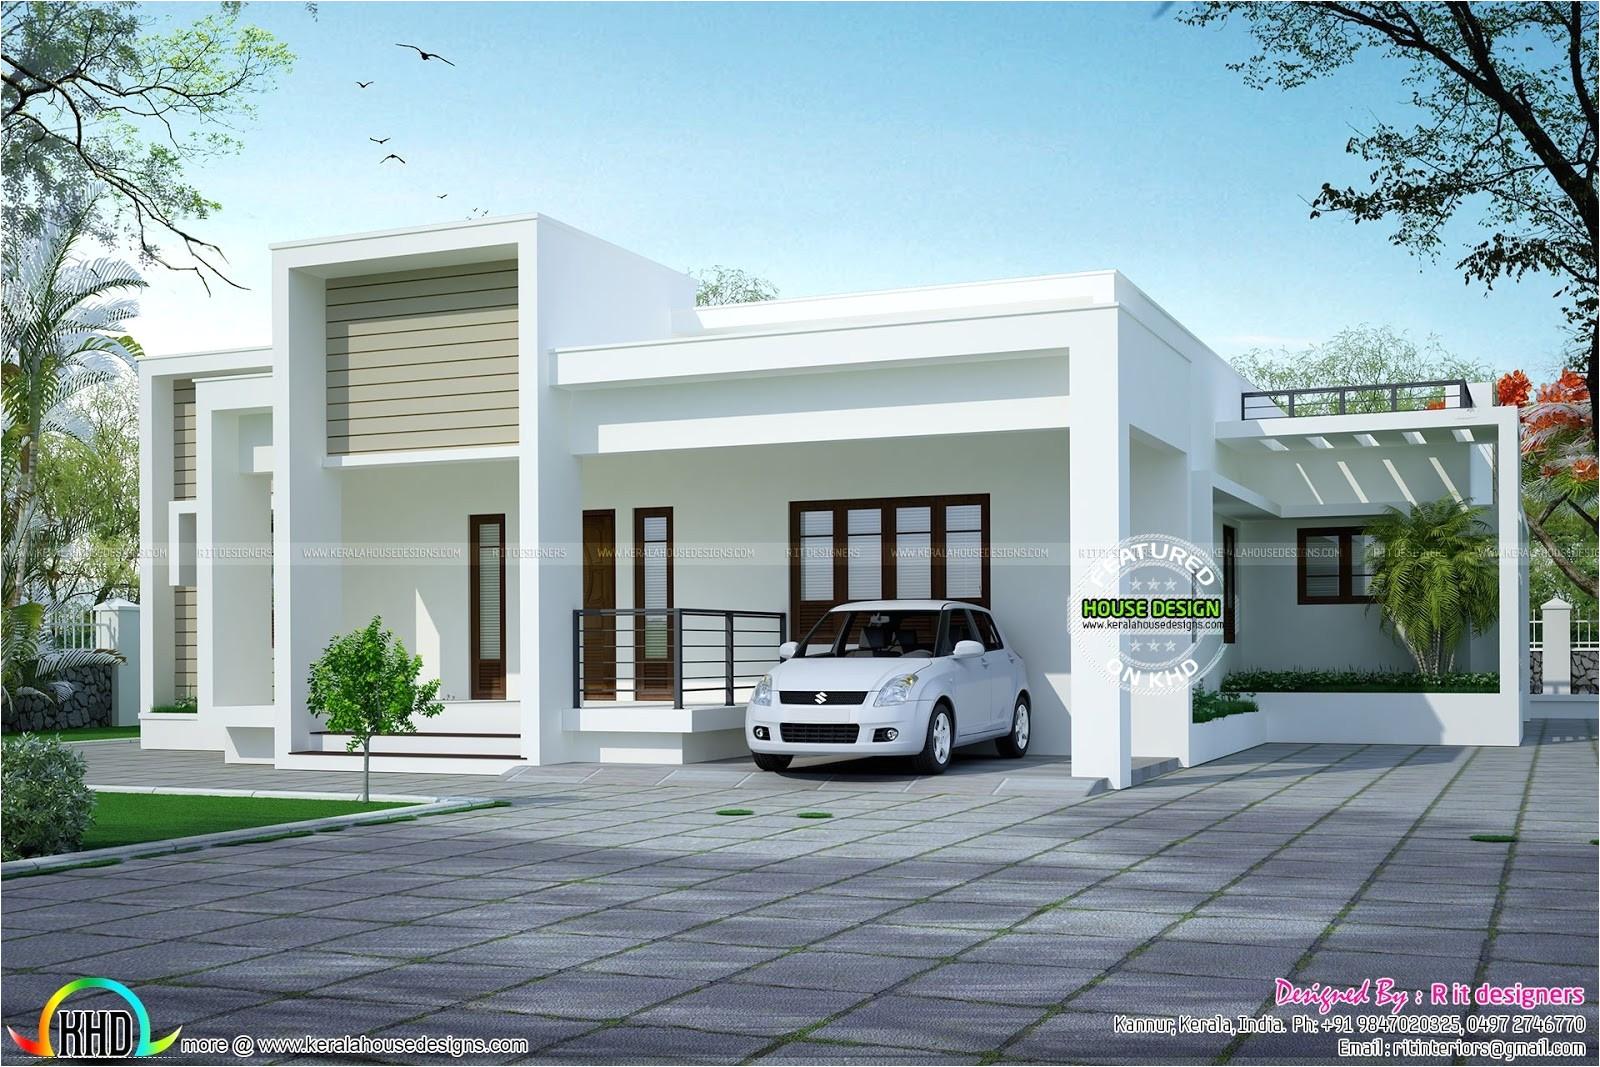 house plans similar to elberton way